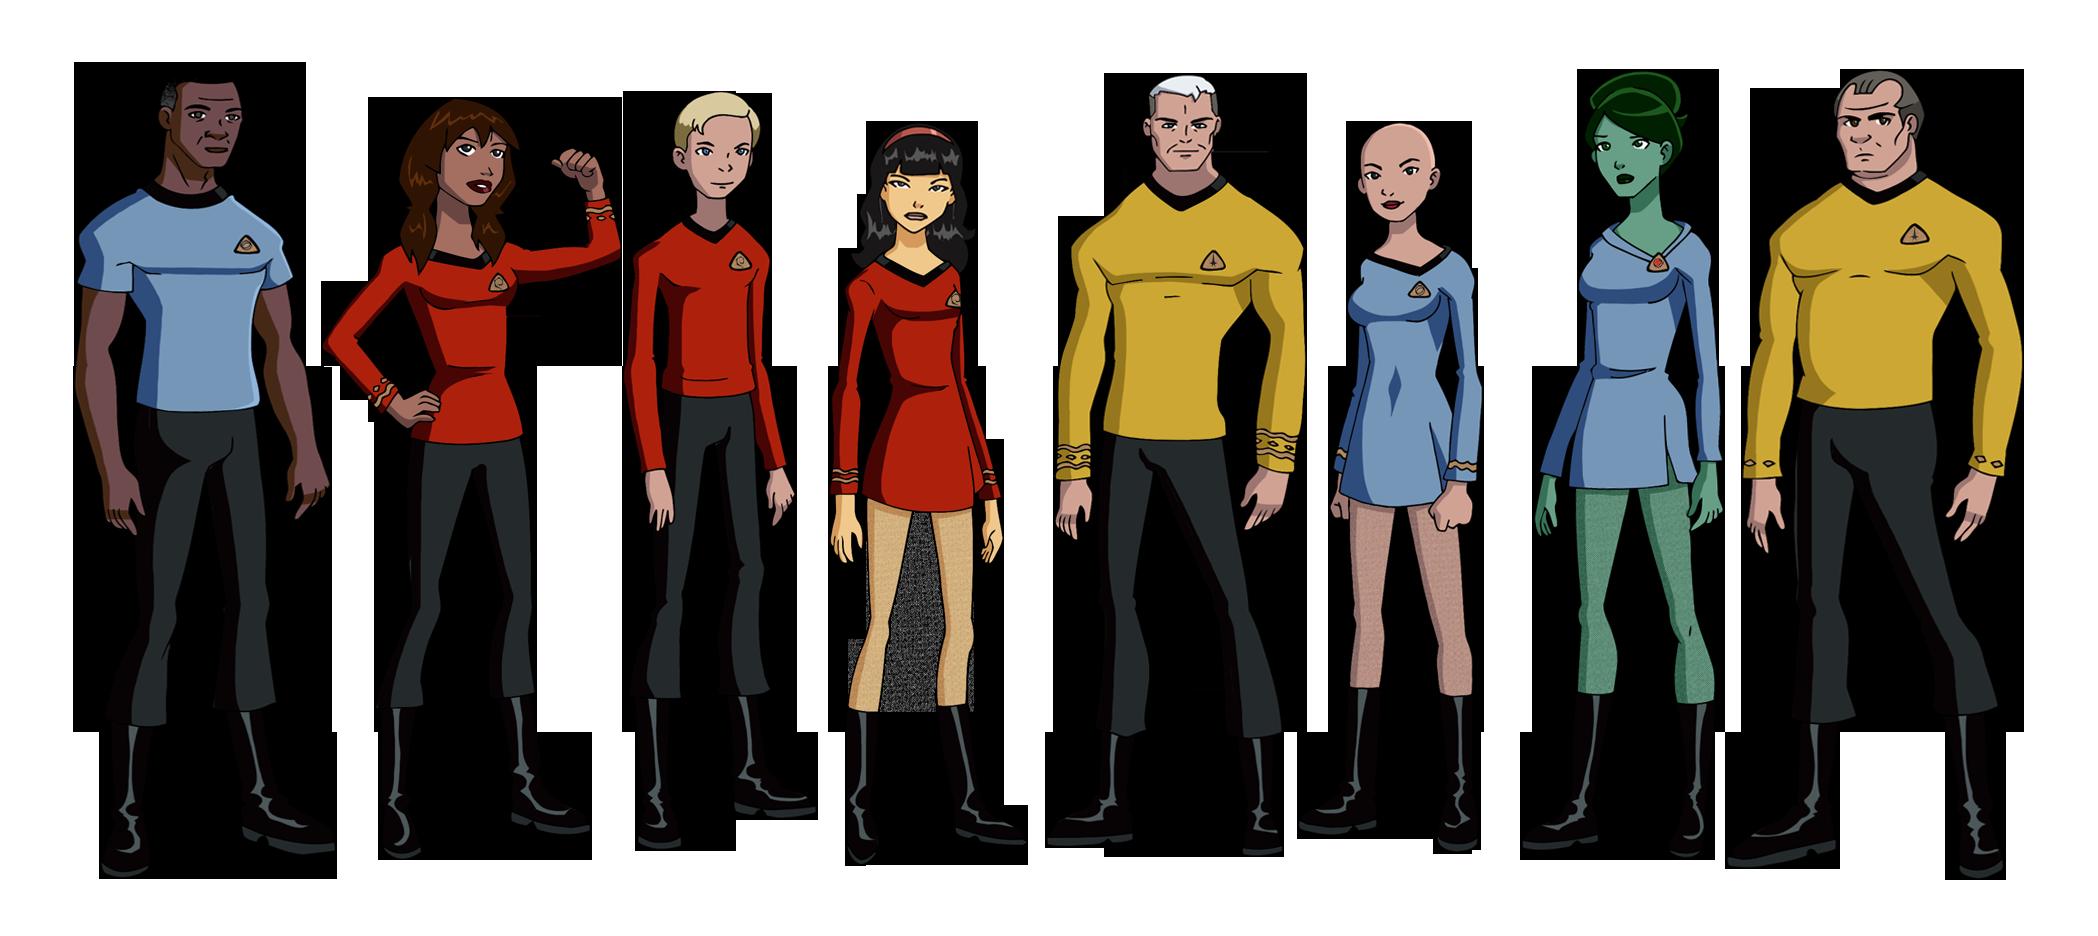 Deviantart Starfleet Captains Tylan Schan: My TOS Fan Crew By Glee-chan On DeviantArt